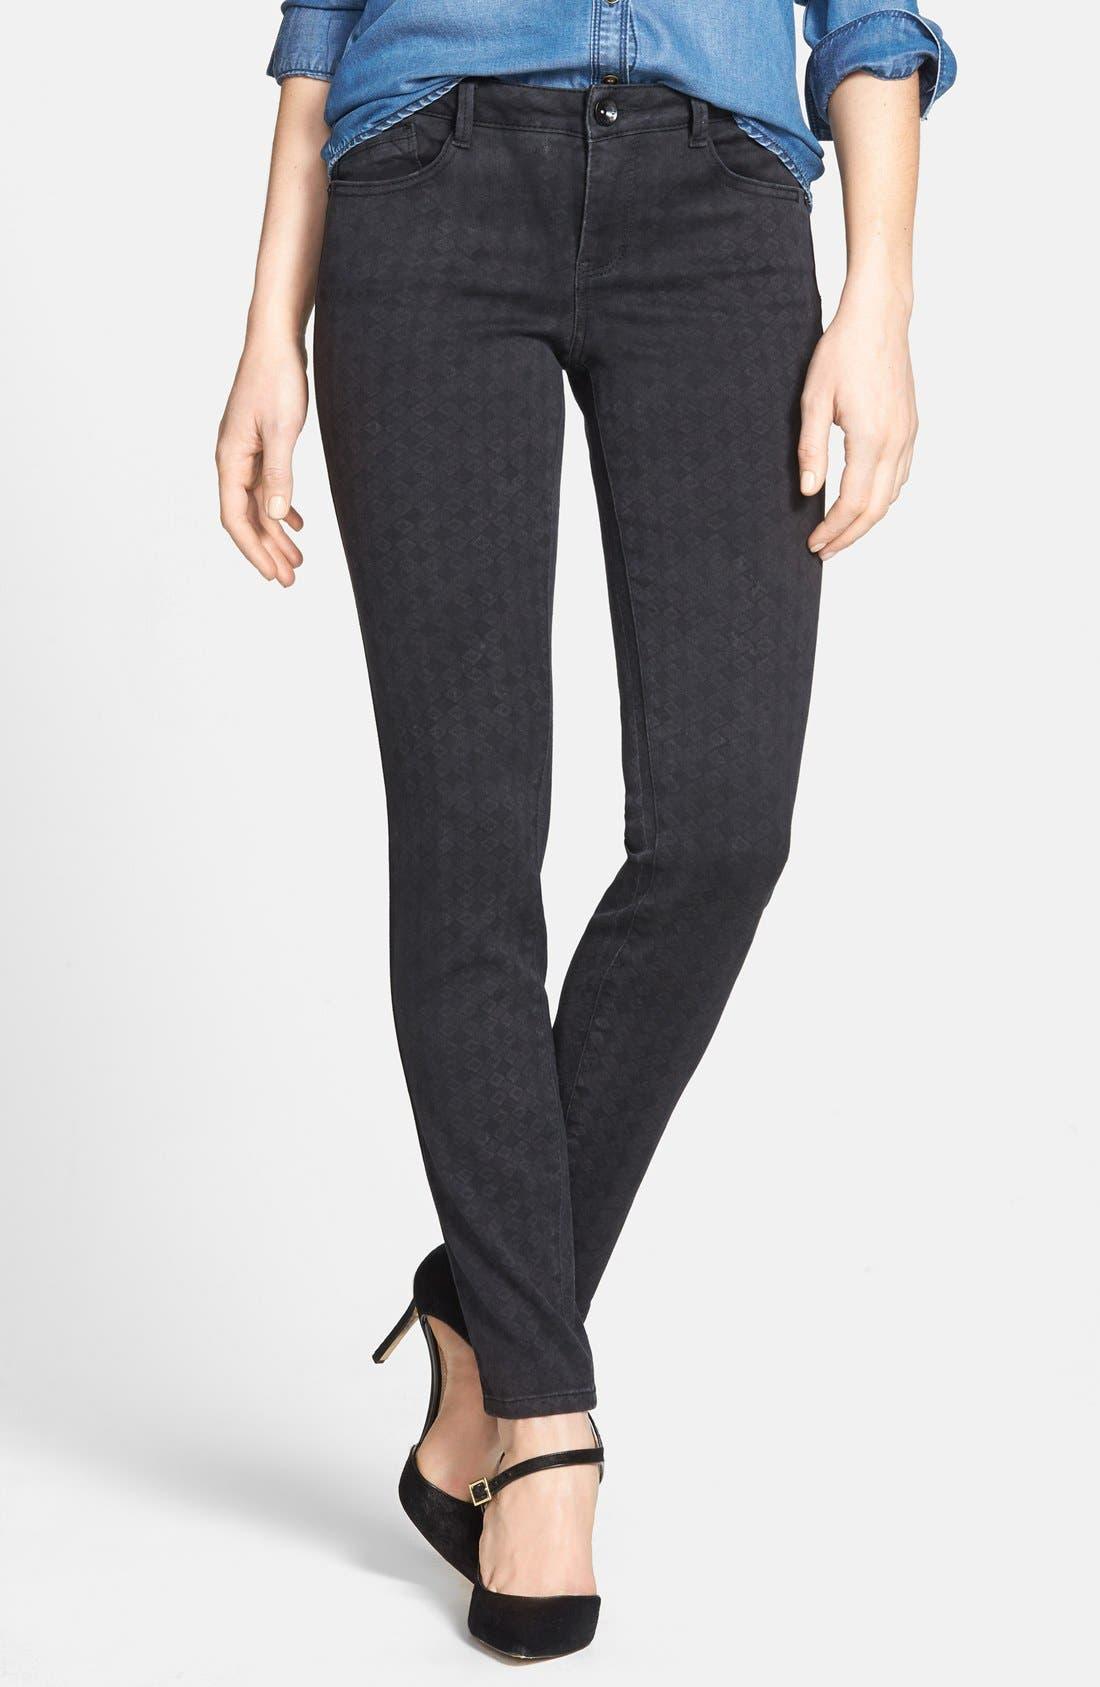 Main Image - Wit & Wisdom Diamond Stencil Skinny Jeans (Black) (Nordstrom Exclusive)